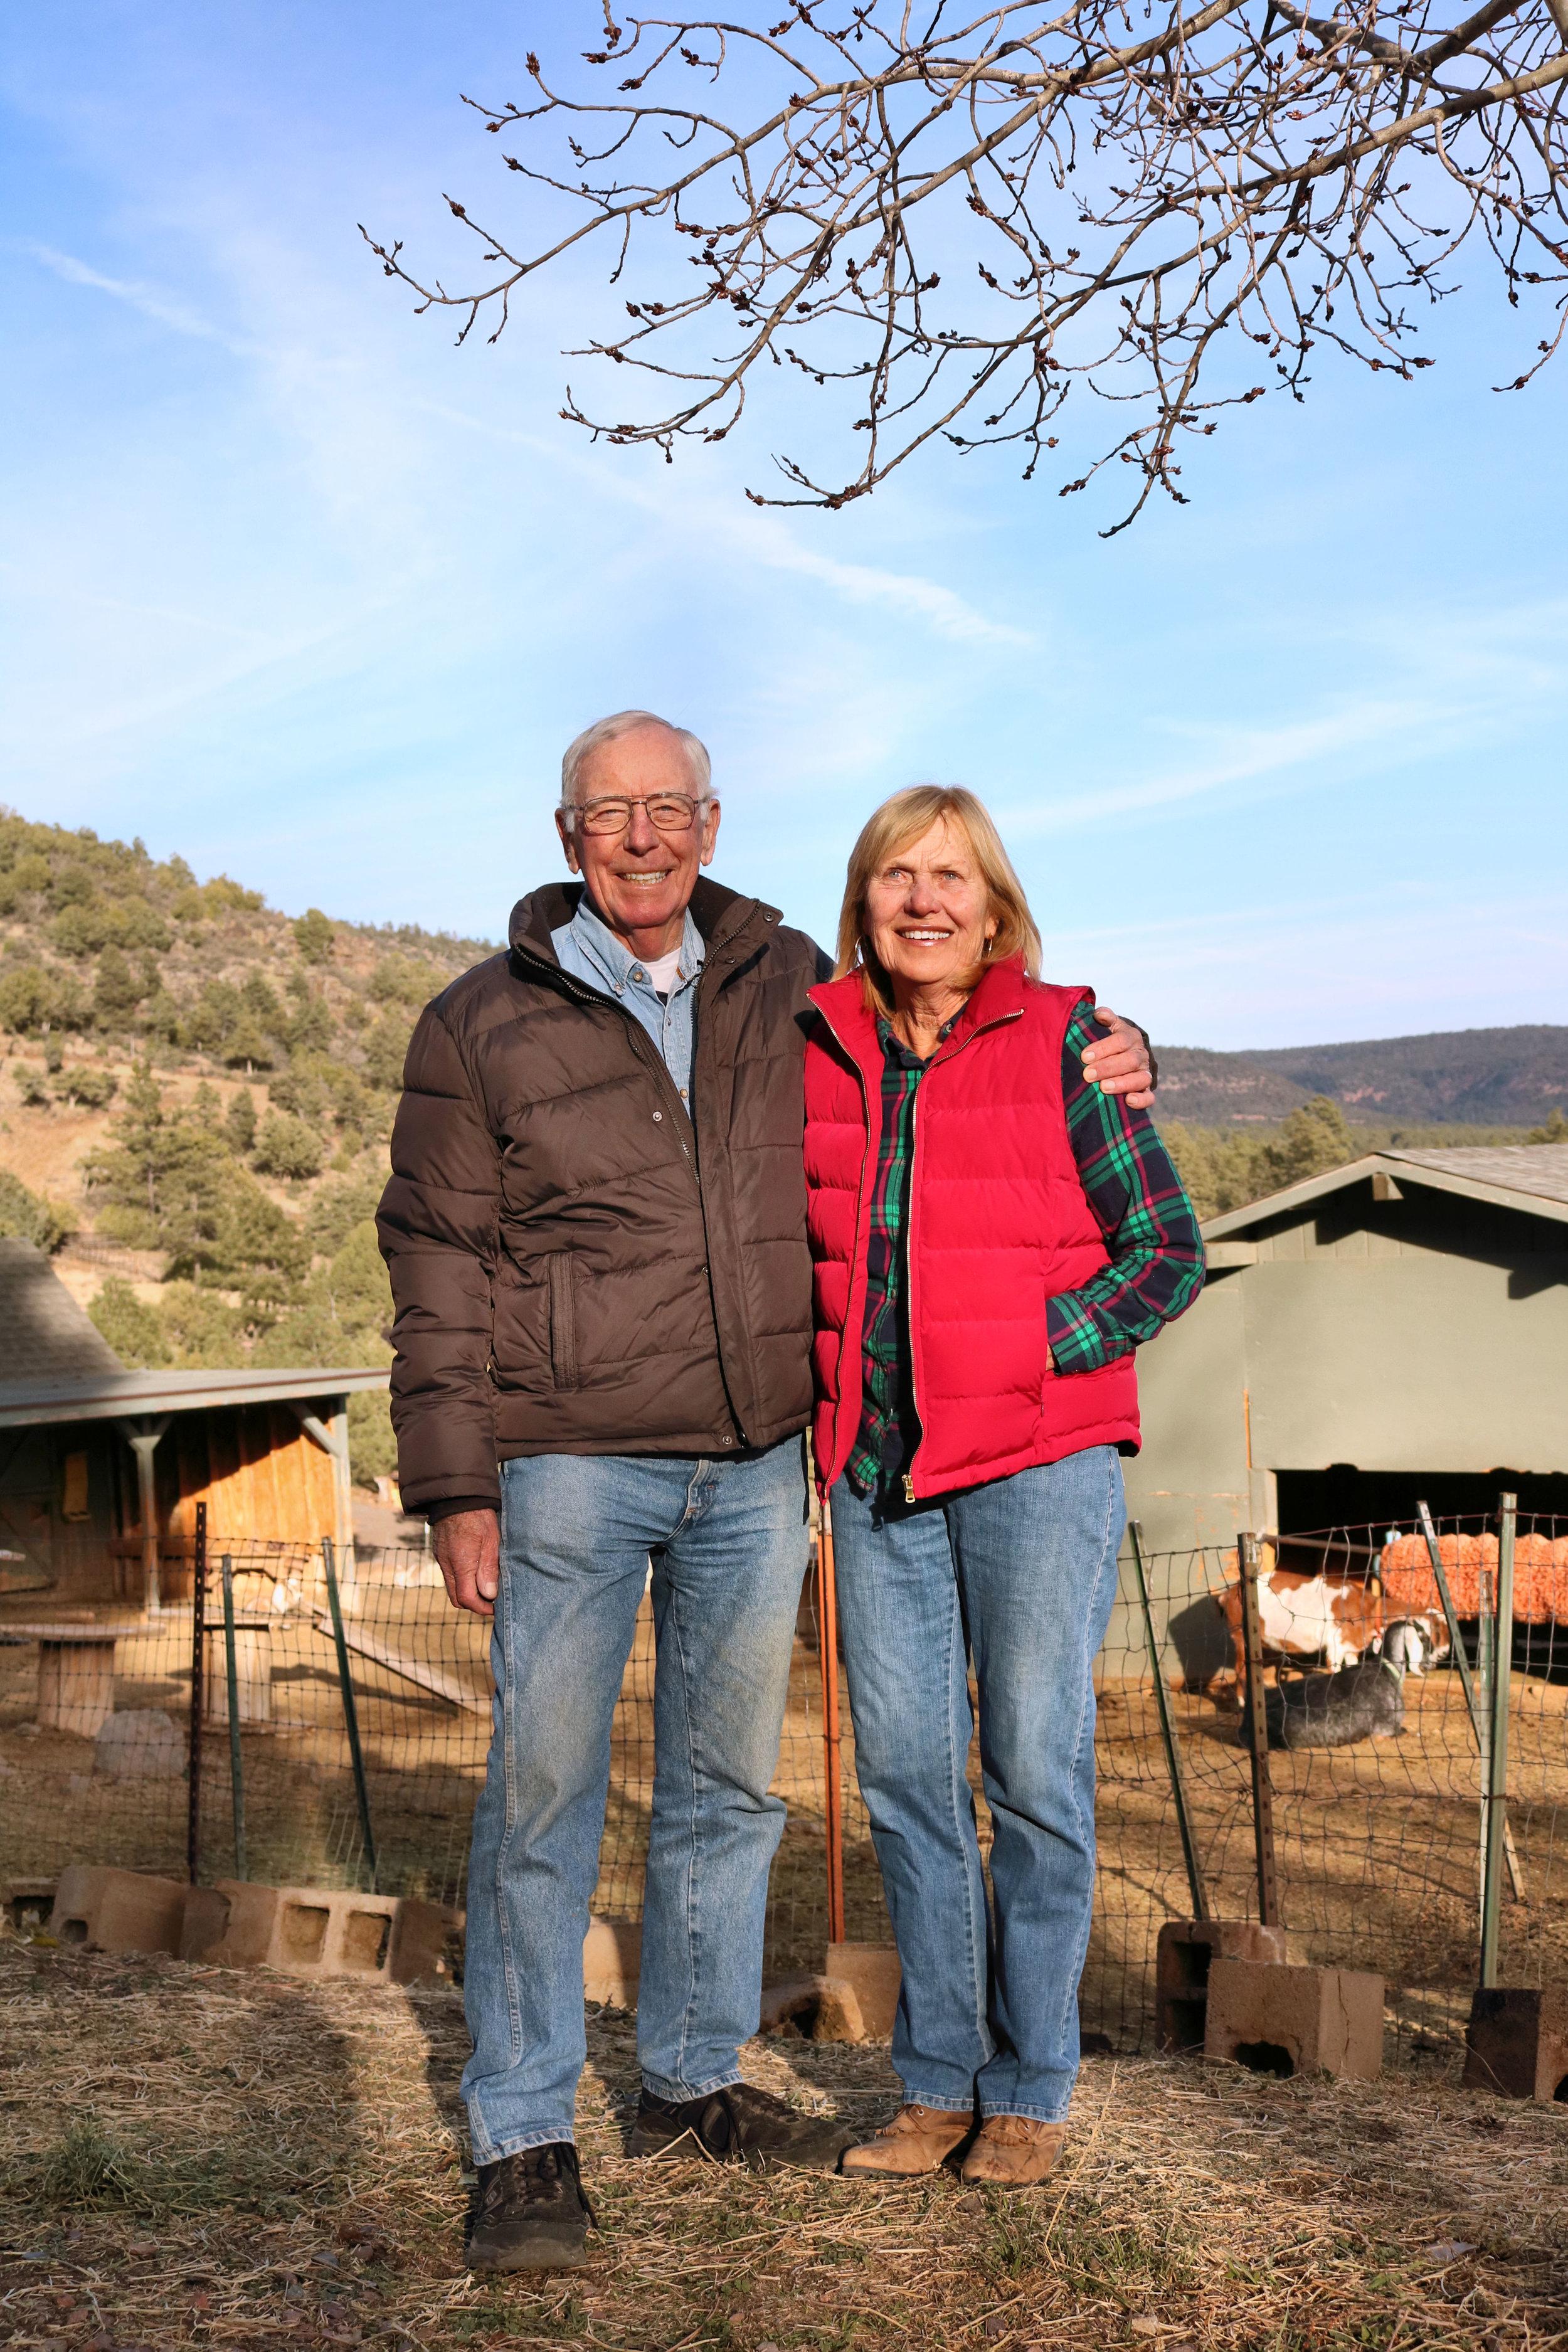 Joyce & John BIttner - Fossil Creek Creamery